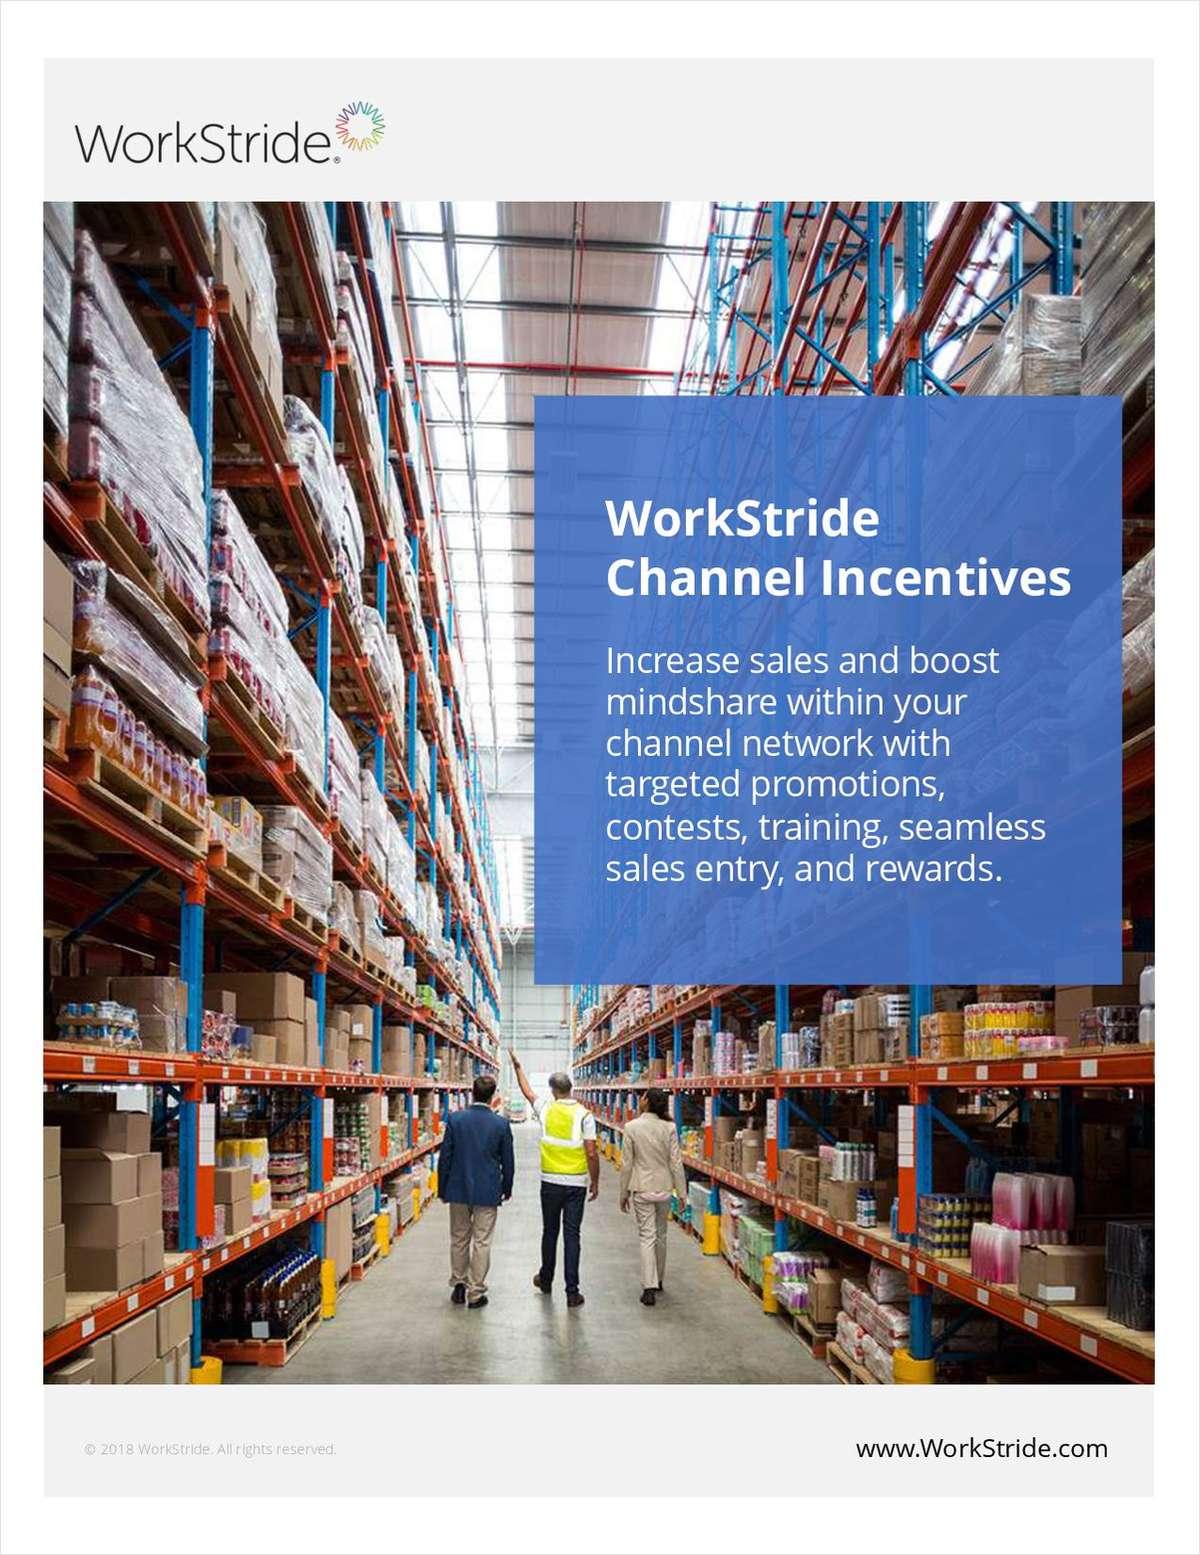 WorkStride Channel Incentives